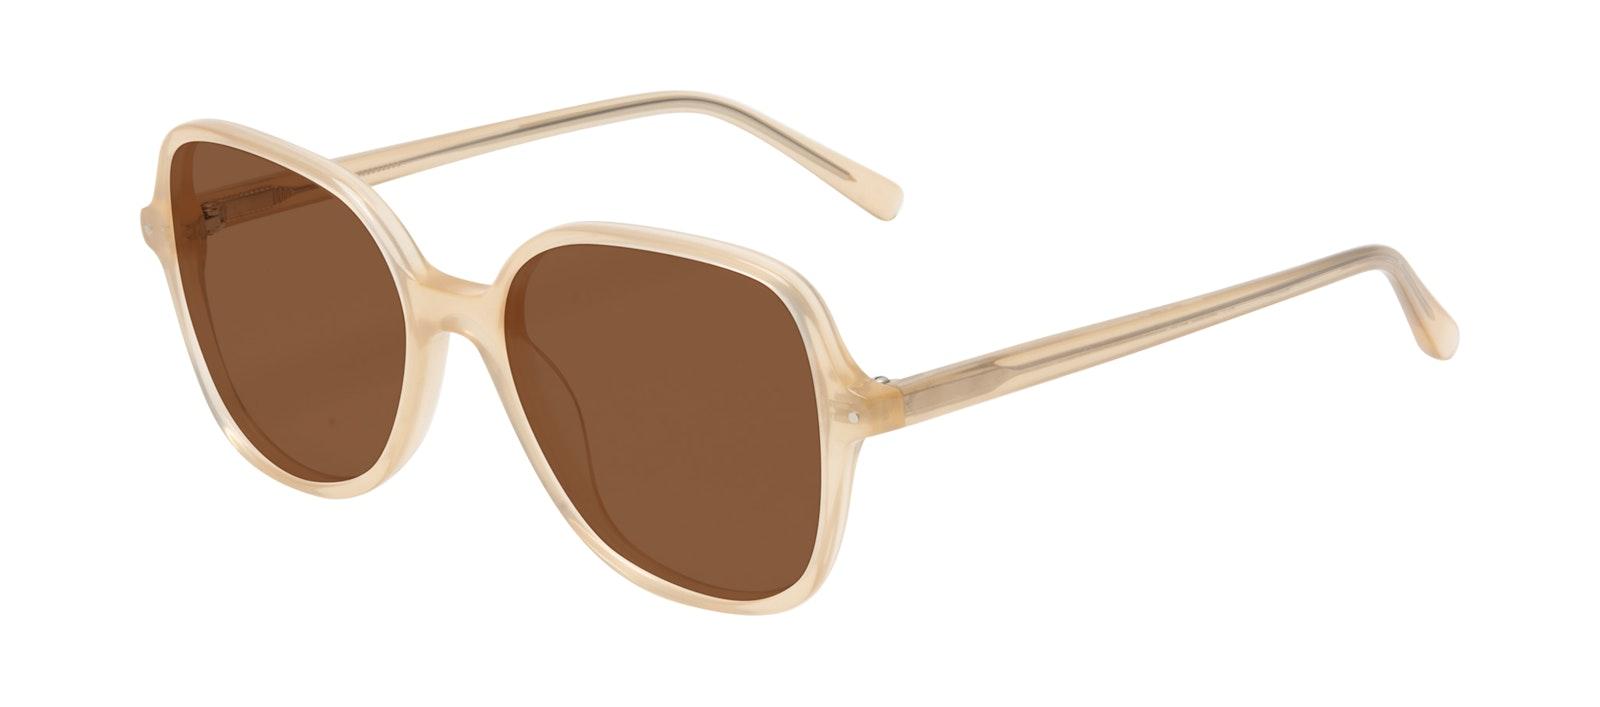 Affordable Fashion Glasses Square Sunglasses Women Scene Peach Tilt